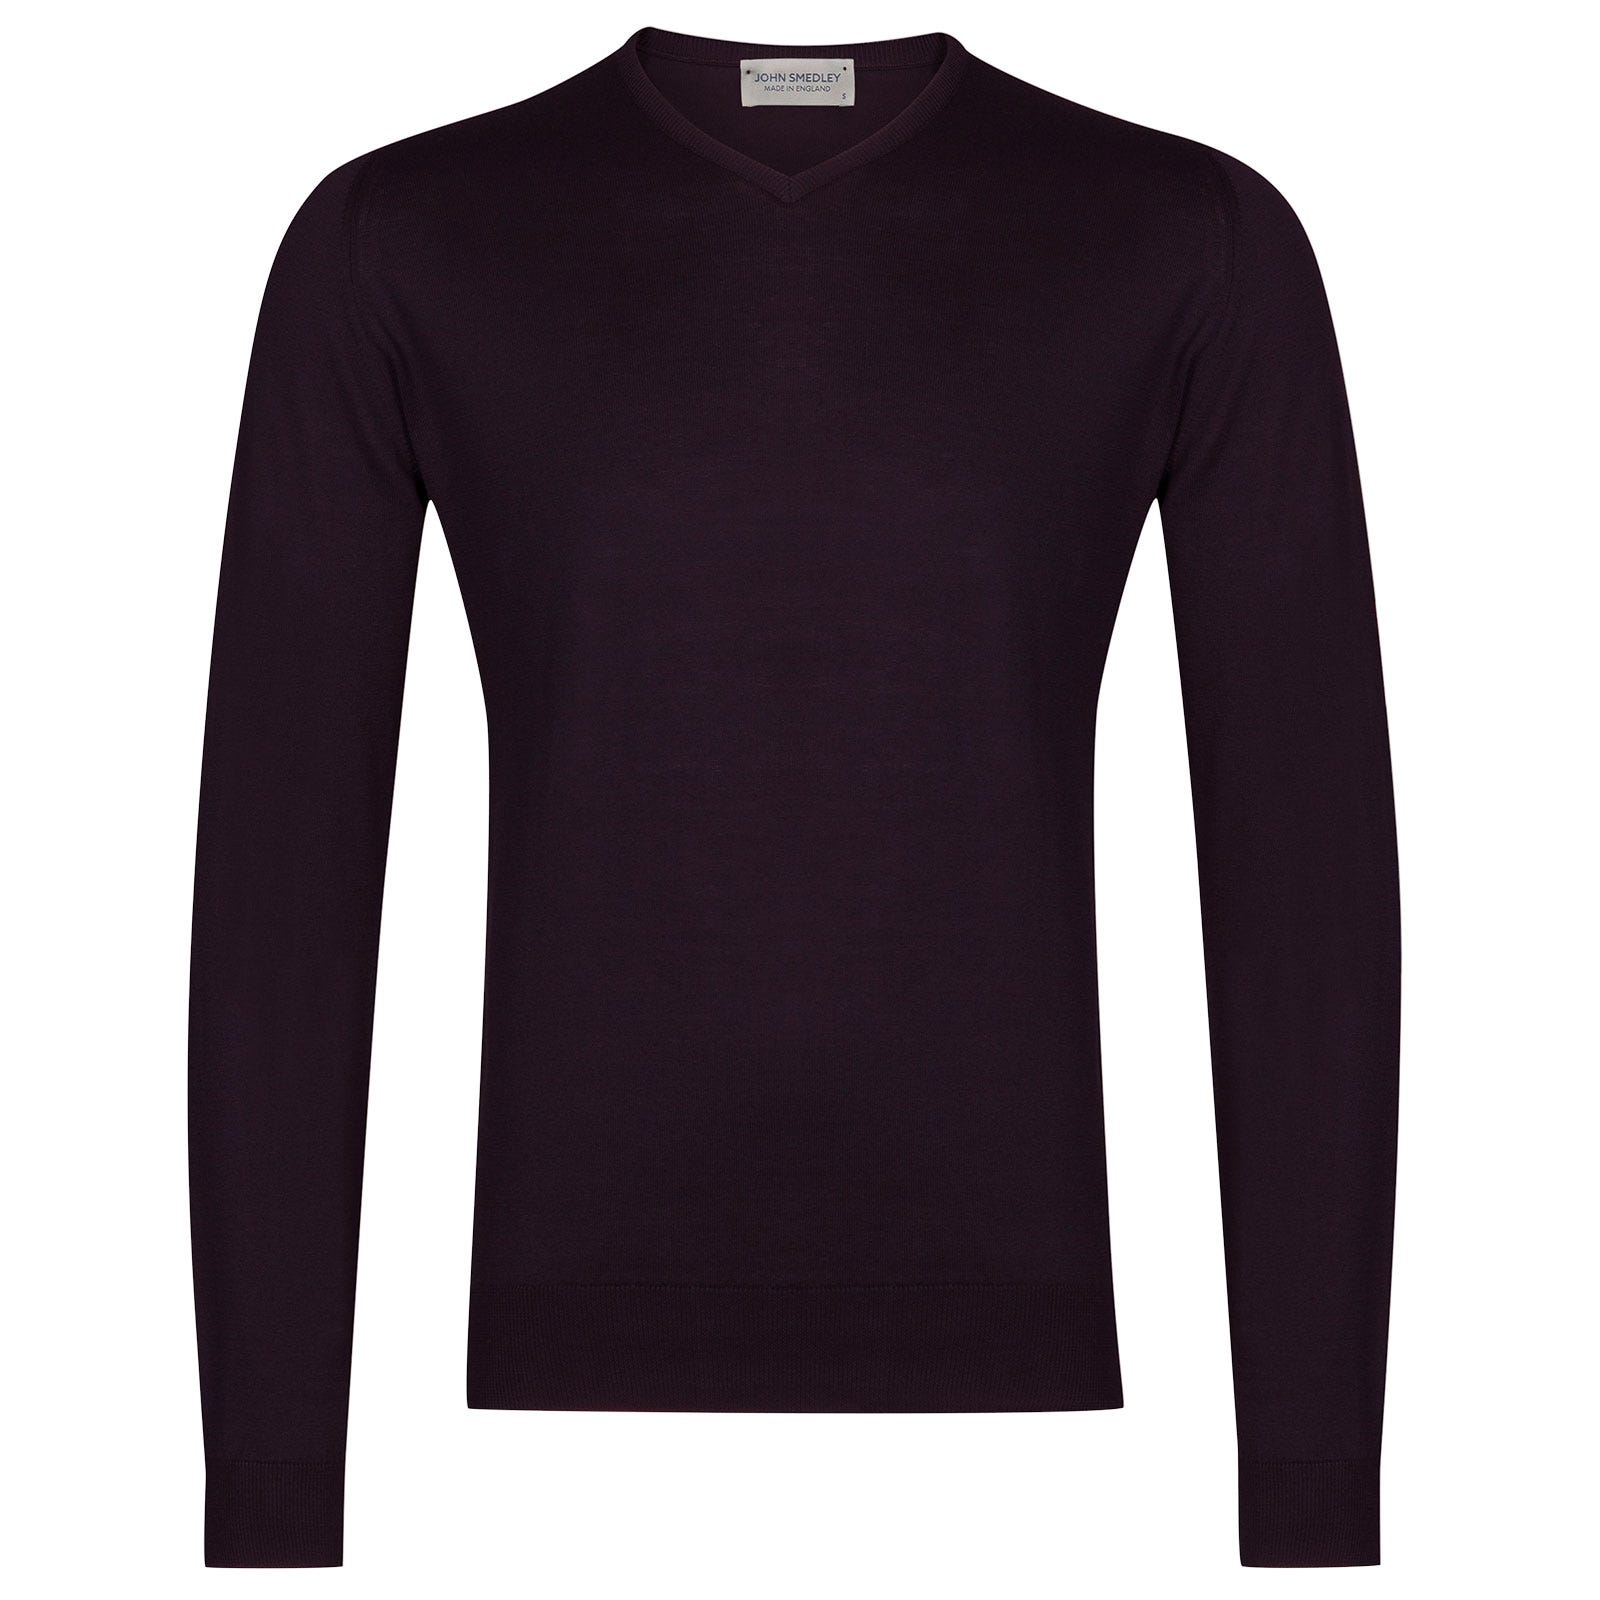 John Smedley Aydon Sea Island Cotton Pullover in Mystic Purple-L